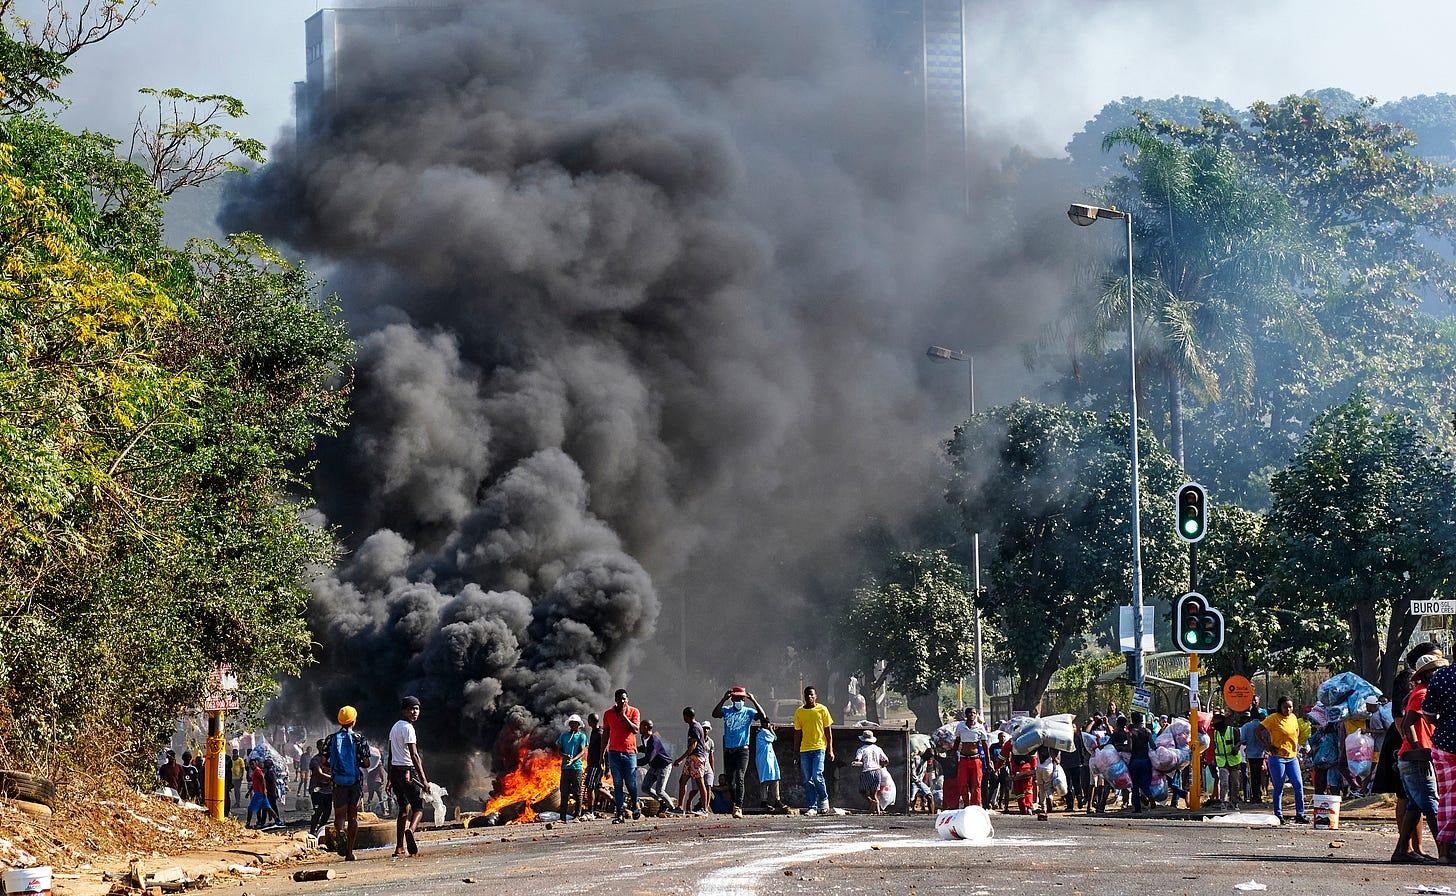 https://cpj.org/wp-content/uploads/2021/07/ap_south-africa_07-13-2021.jpg